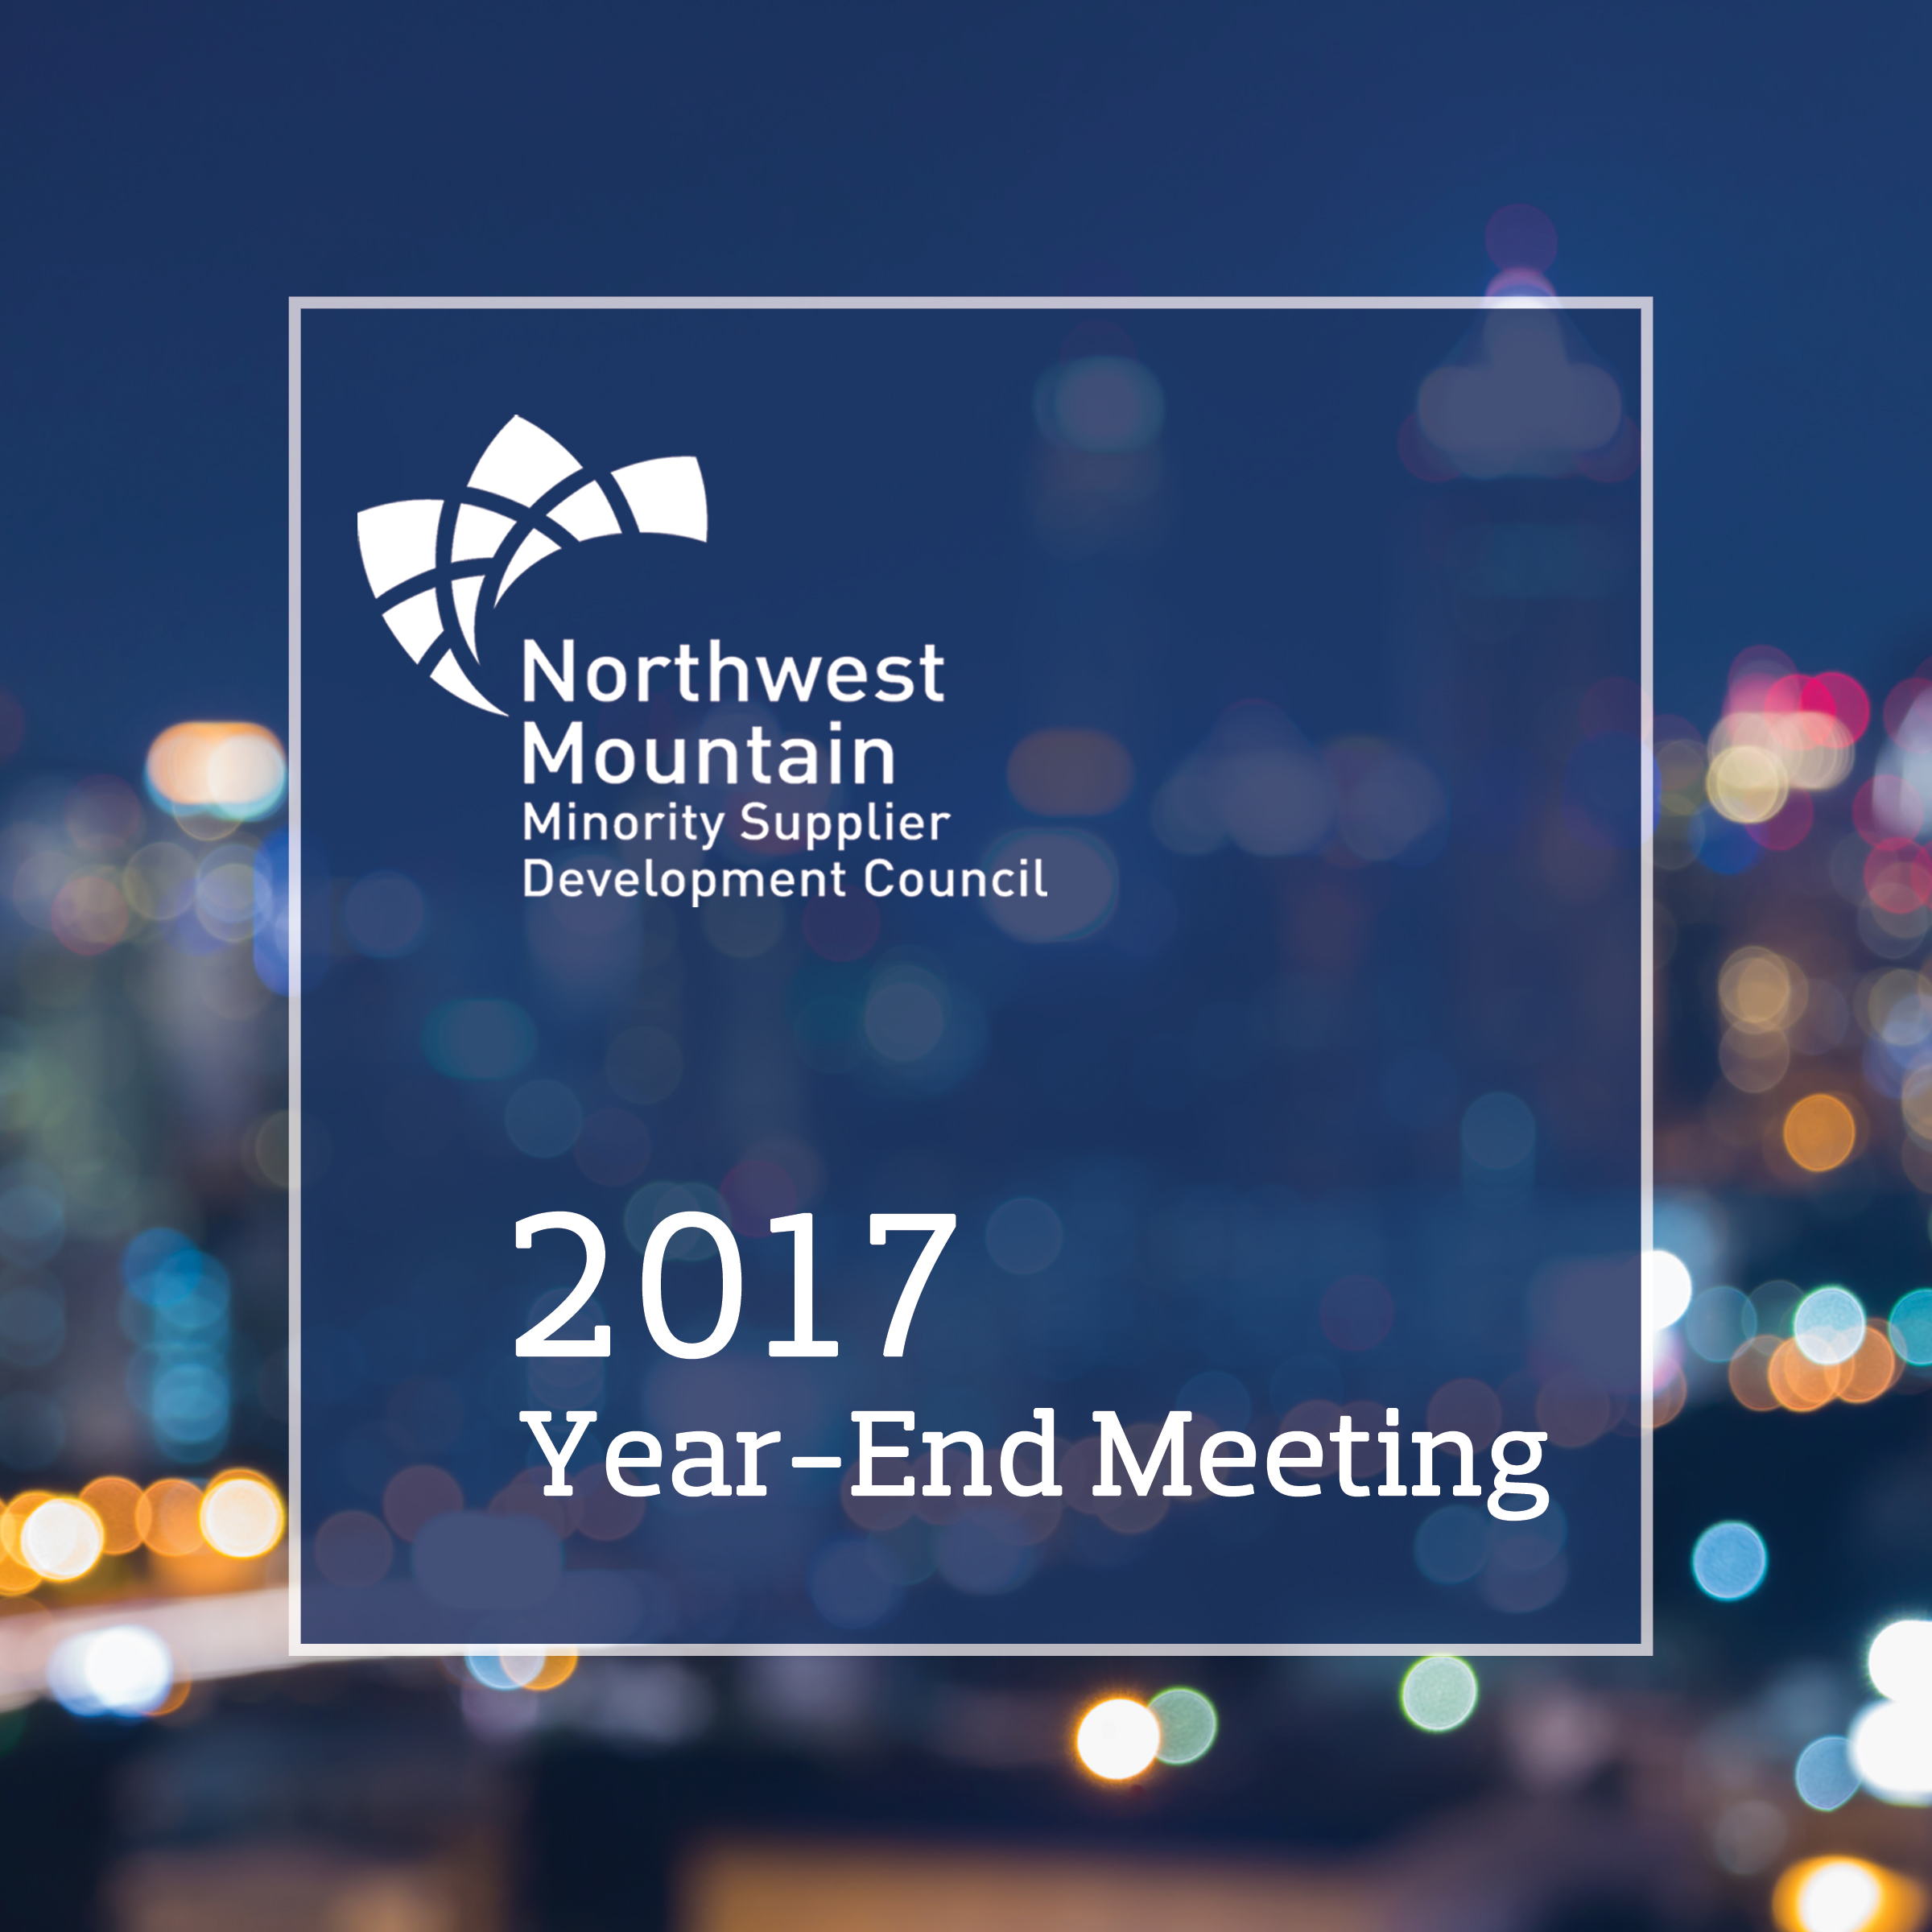 2017-Year-End-Meeting-SQ.jpg